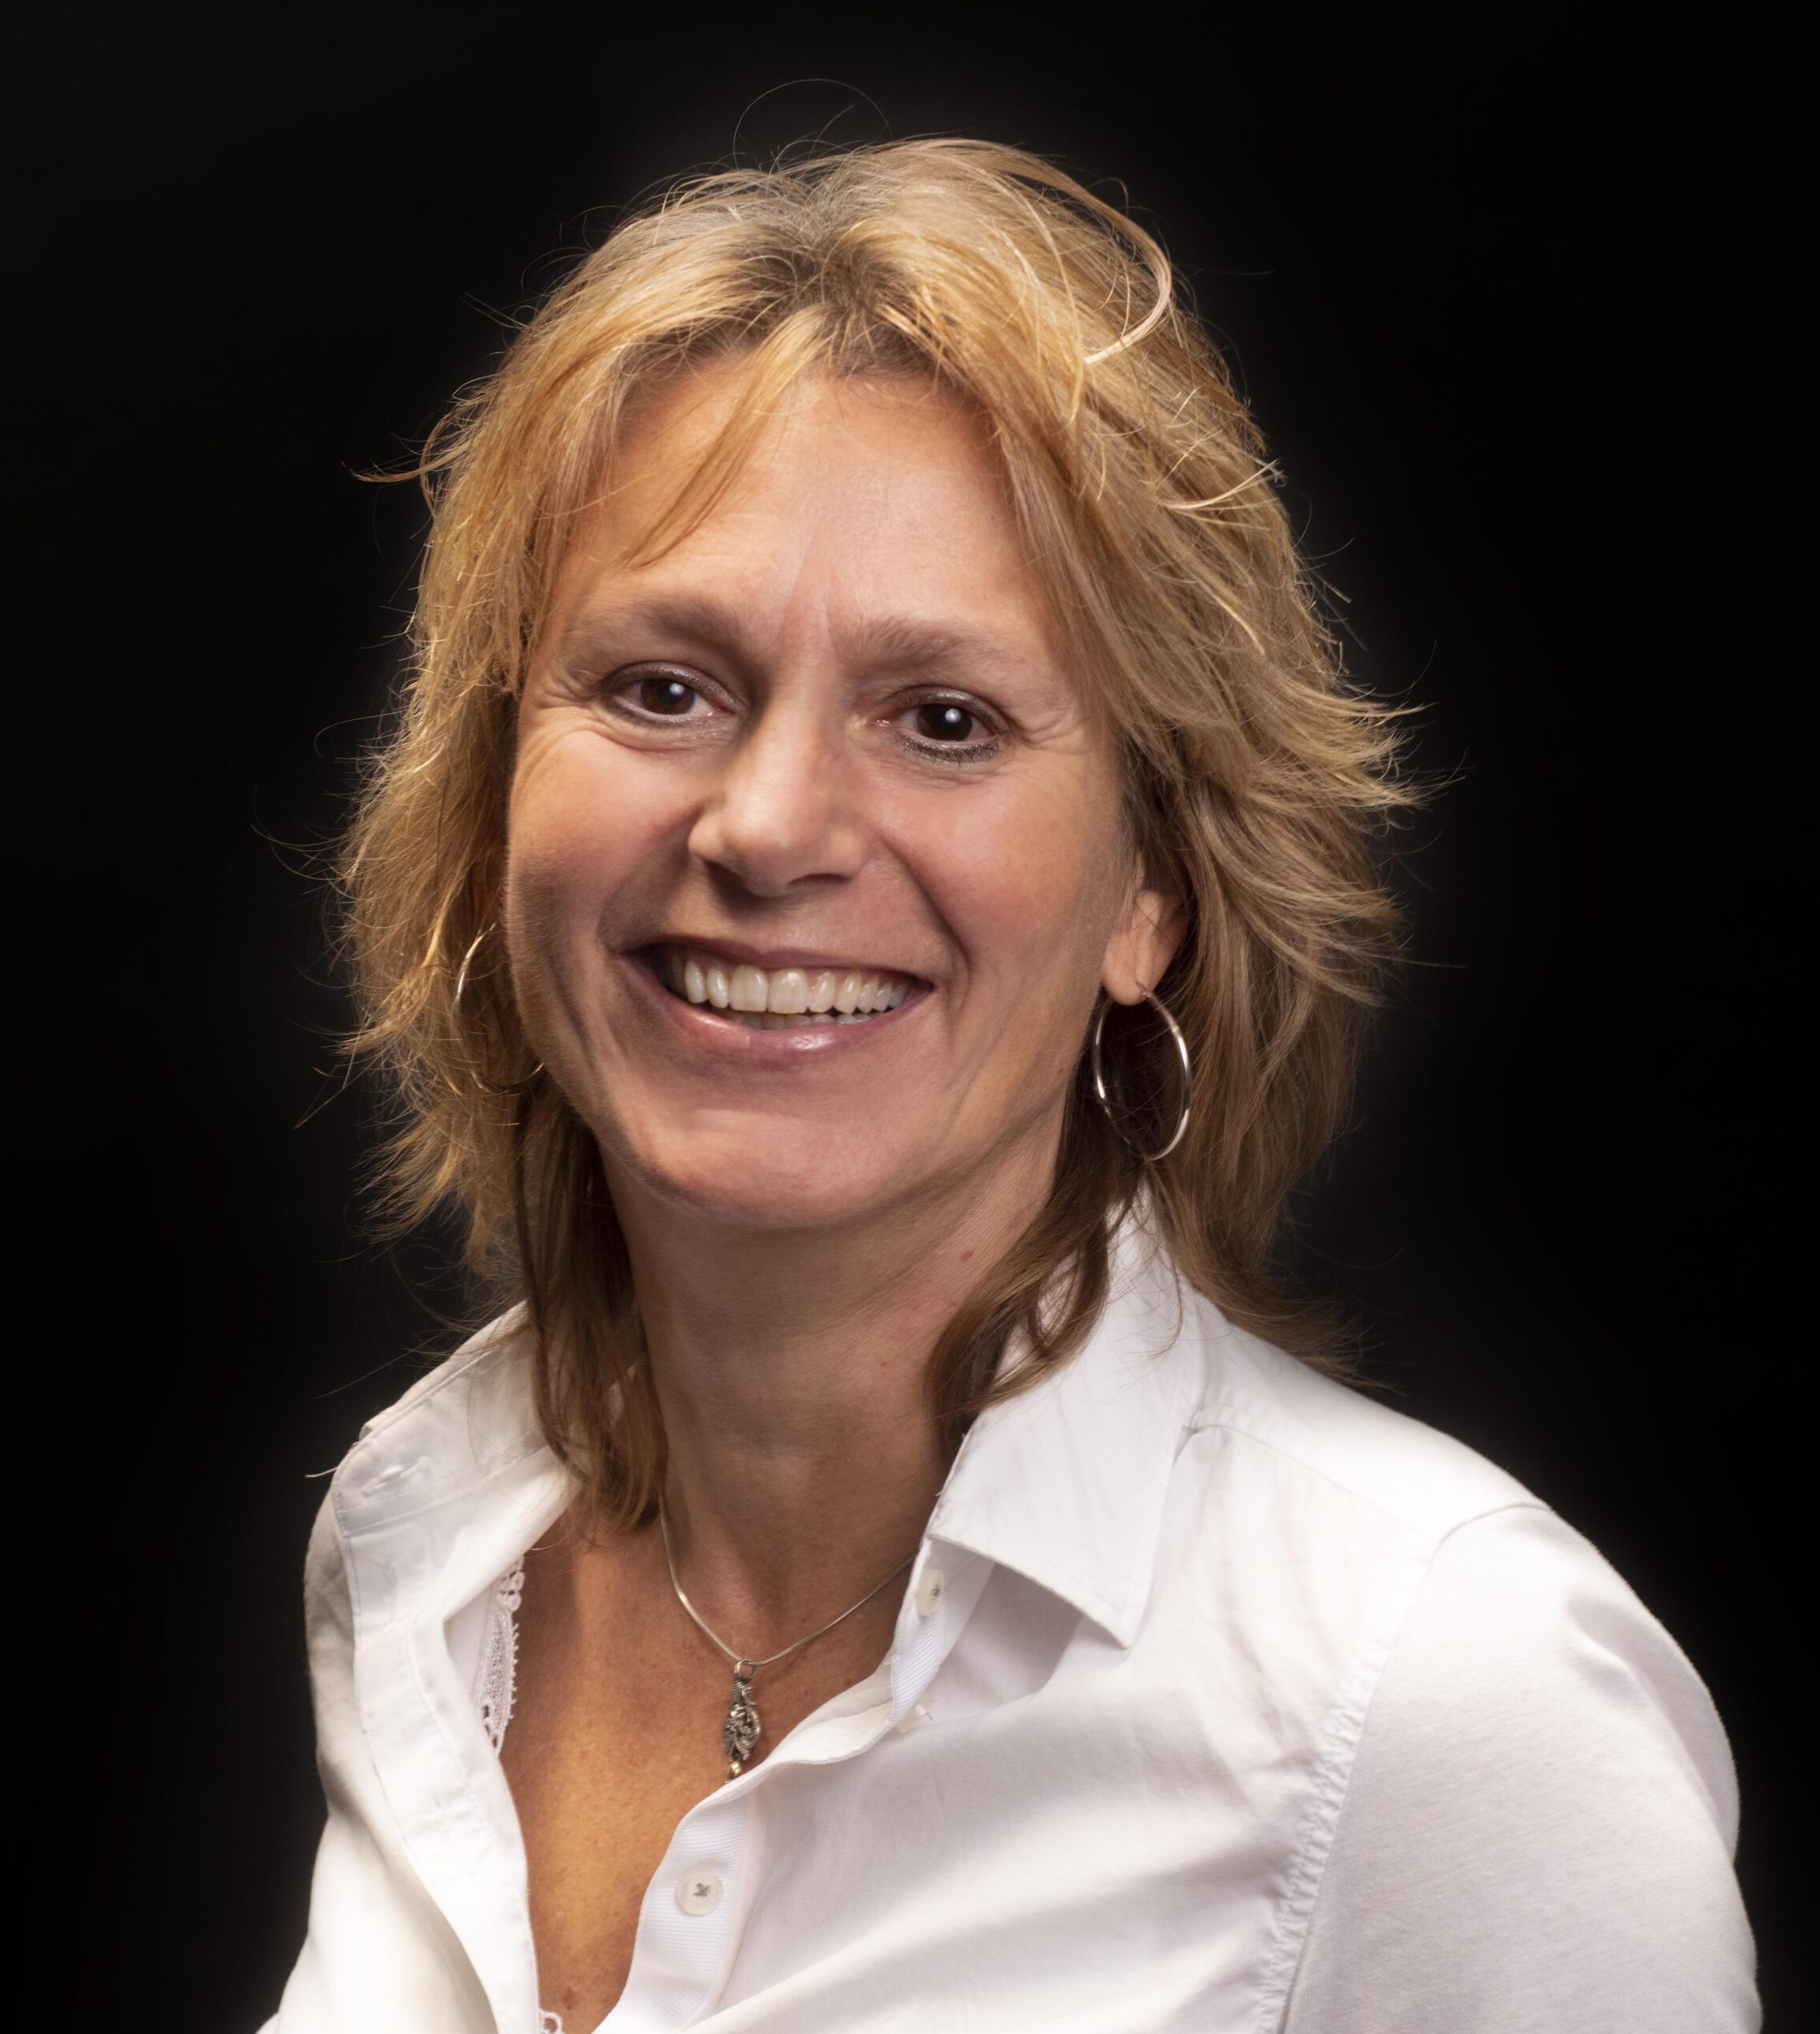 Inge Trilsbeek